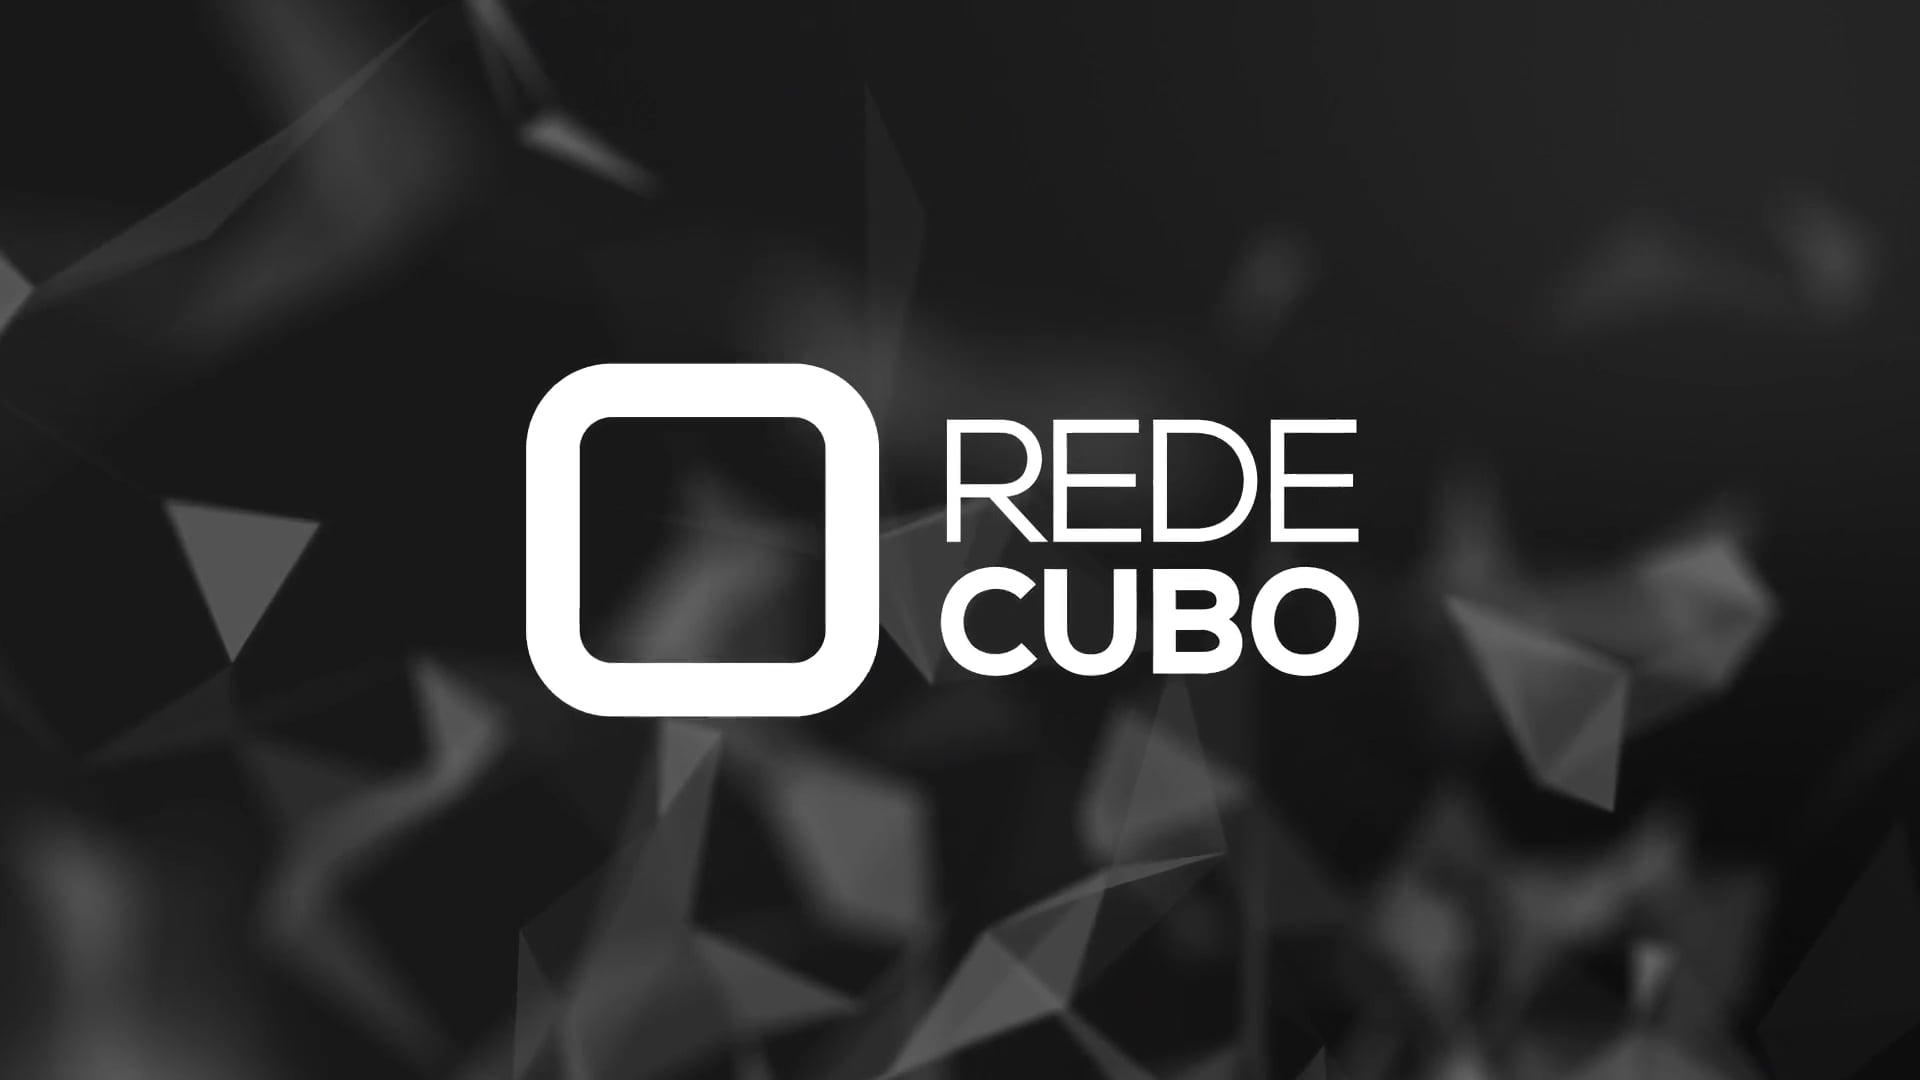 VINHETA REDE CUBO 2017